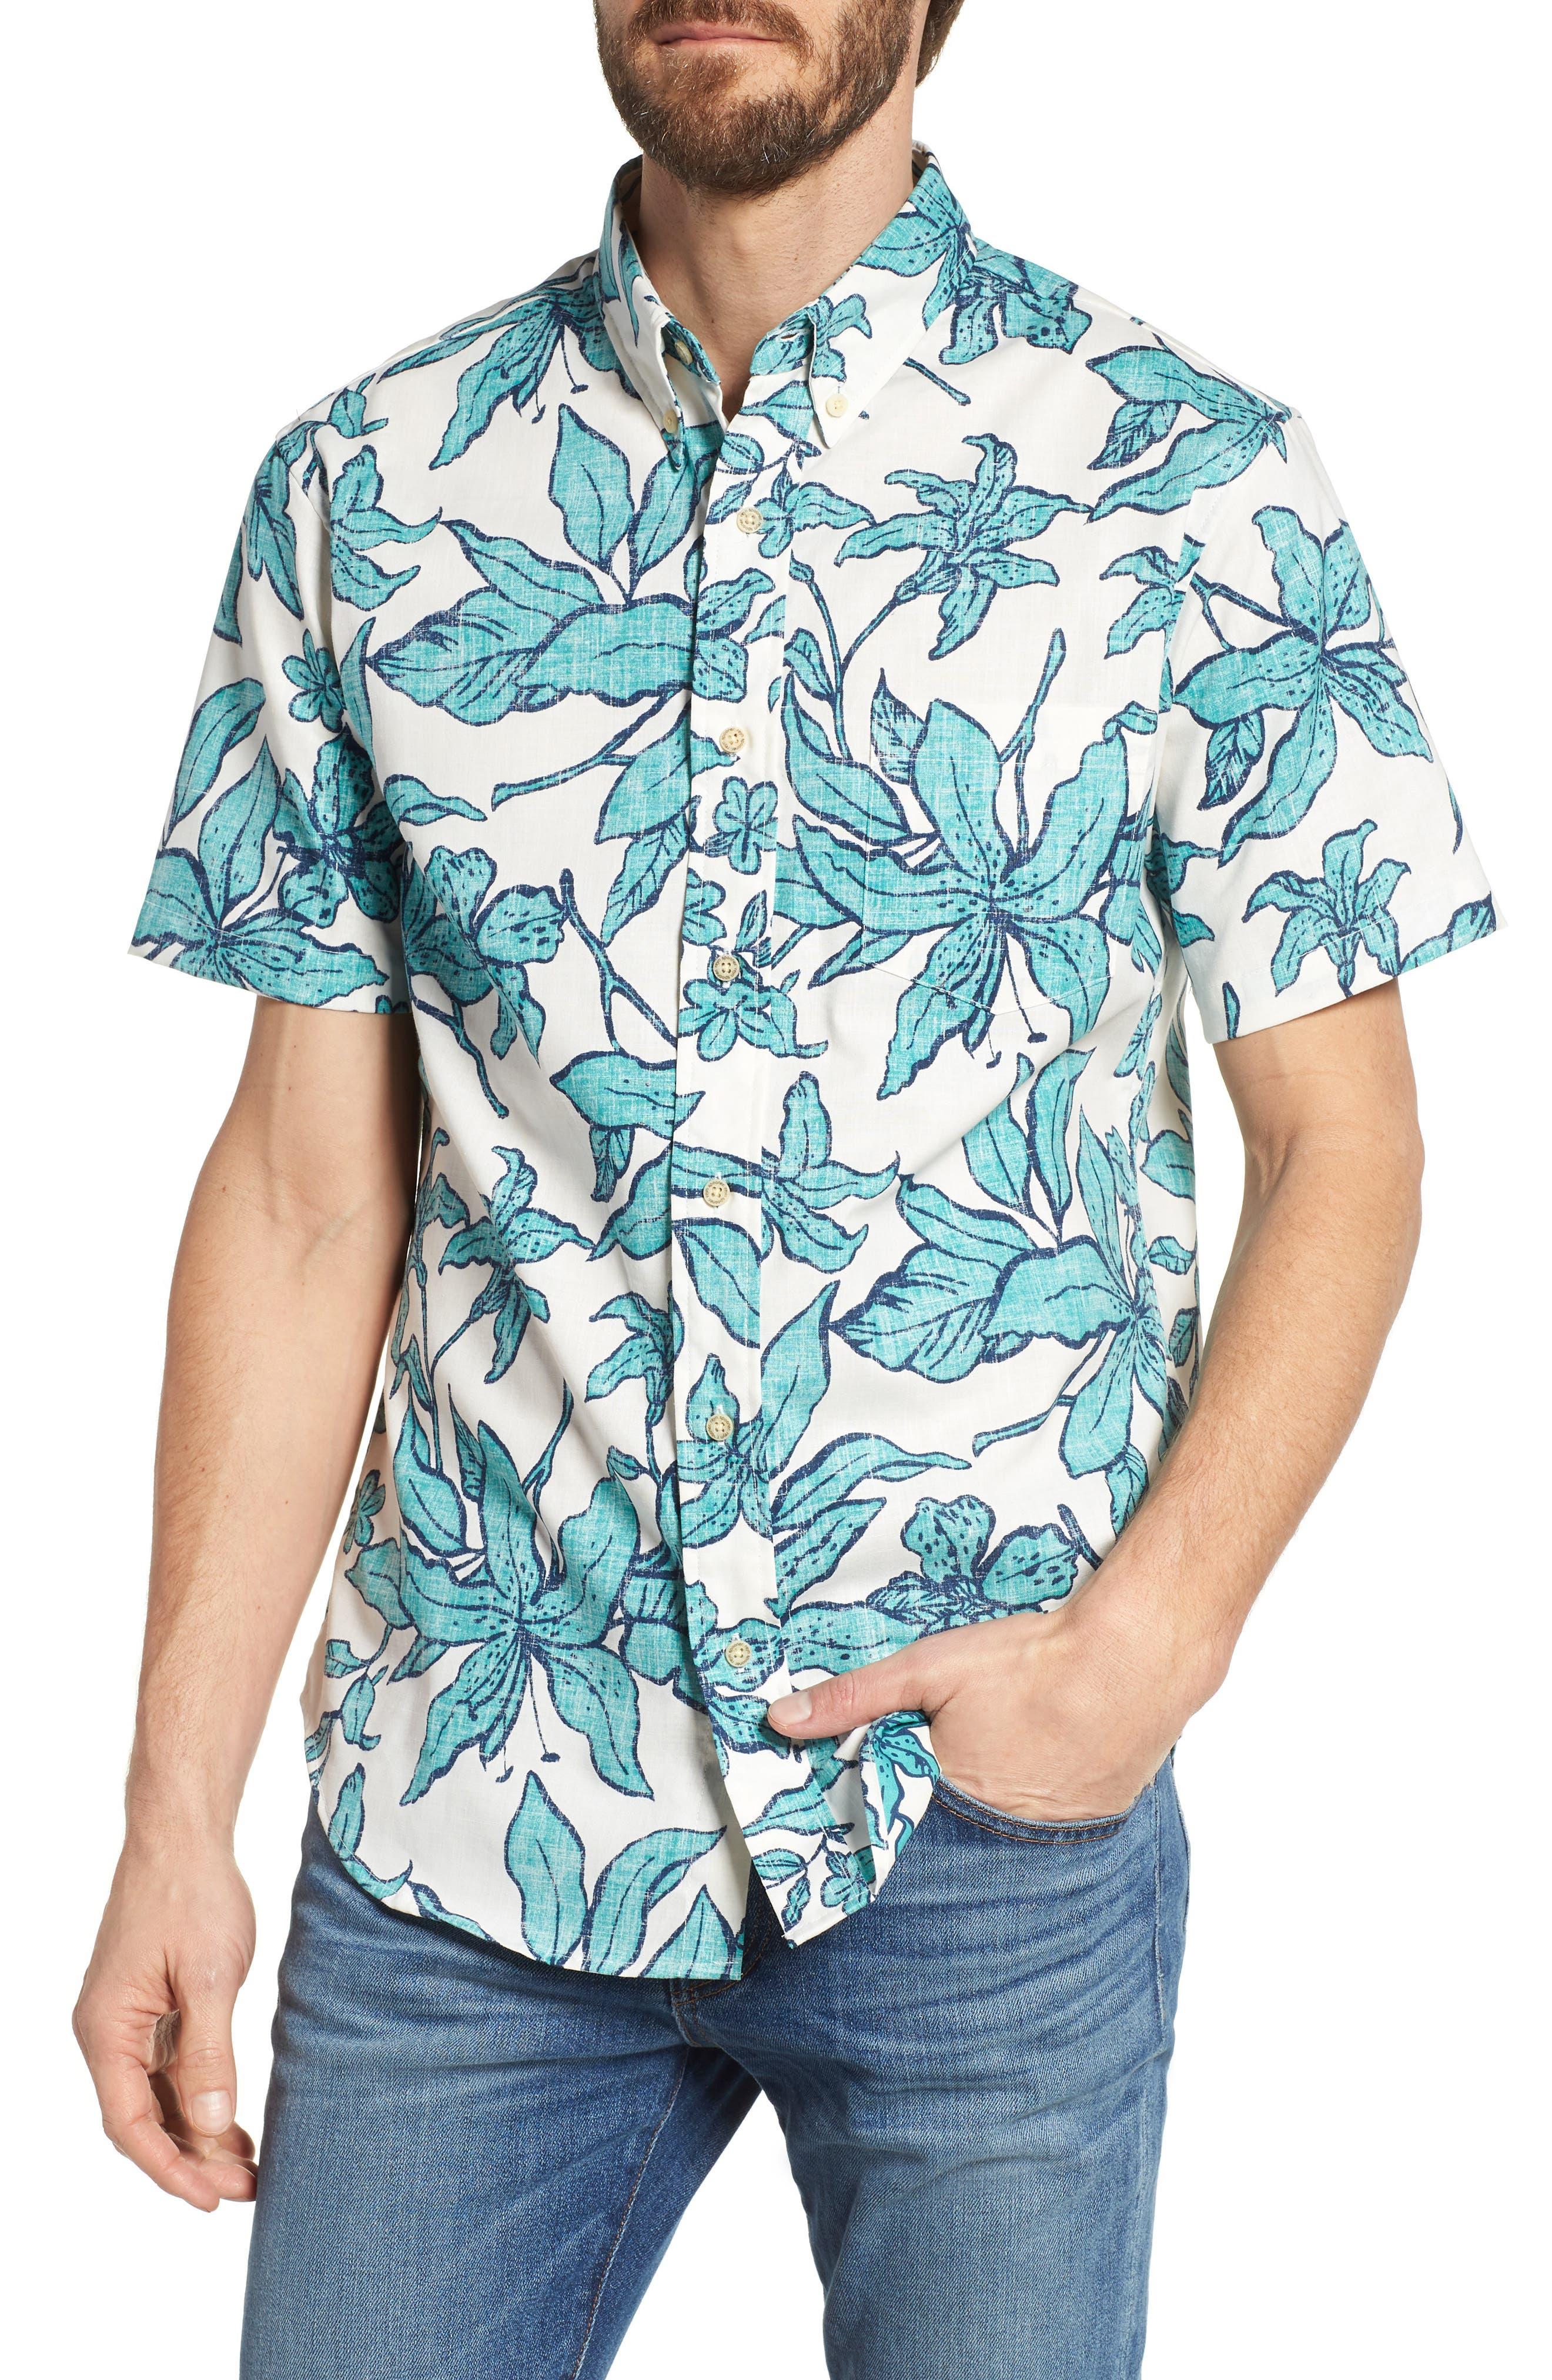 Luhiehu Tailored Fit Print Camp Shirt,                         Main,                         color, 104